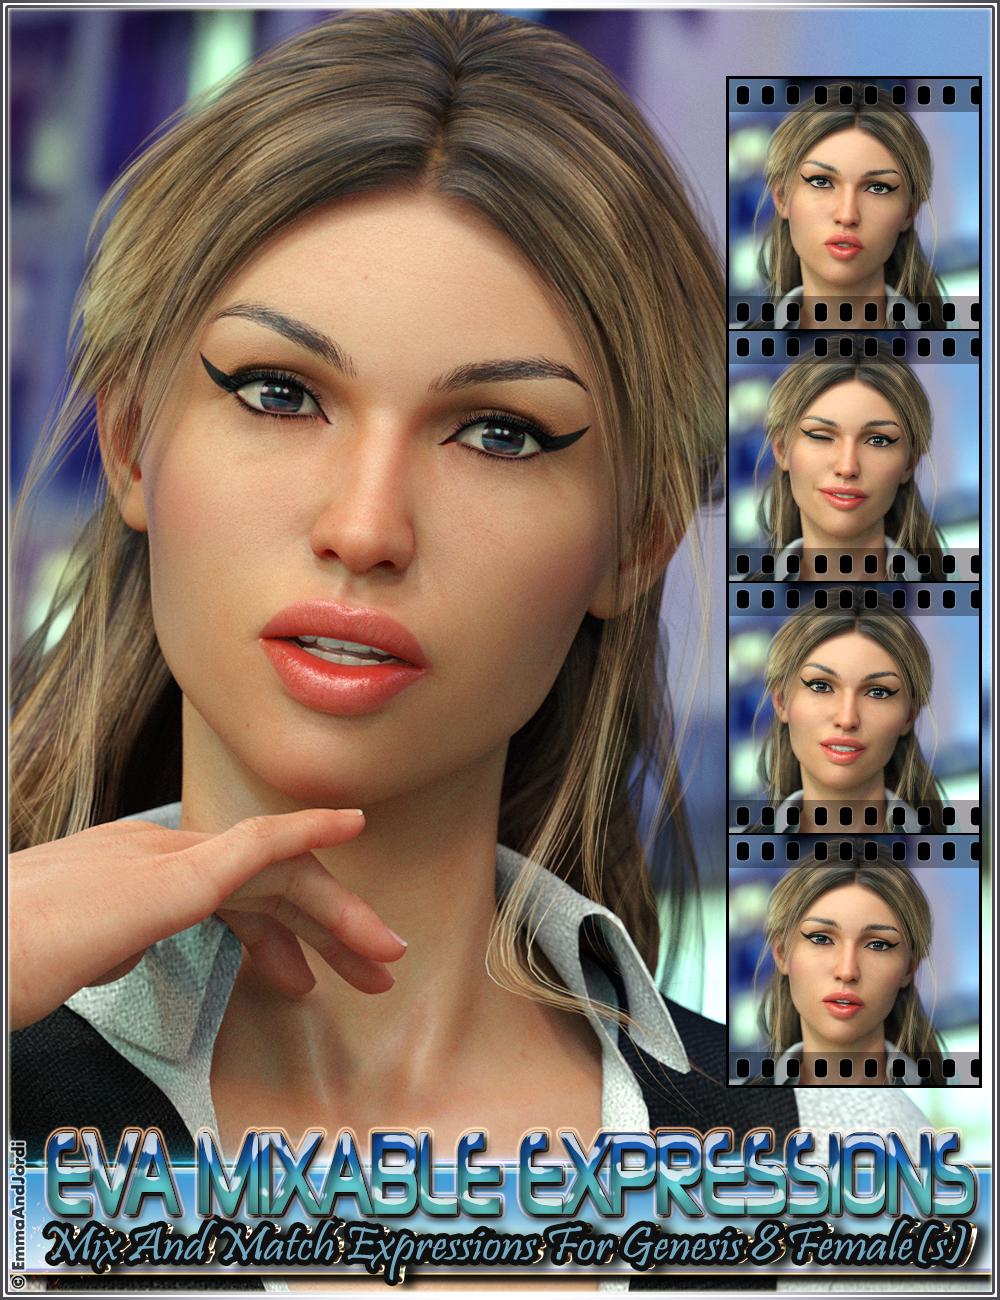 Eva Mixable Expressions for Genesis 8 Female(s) by: EmmaAndJordi, 3D Models by Daz 3D